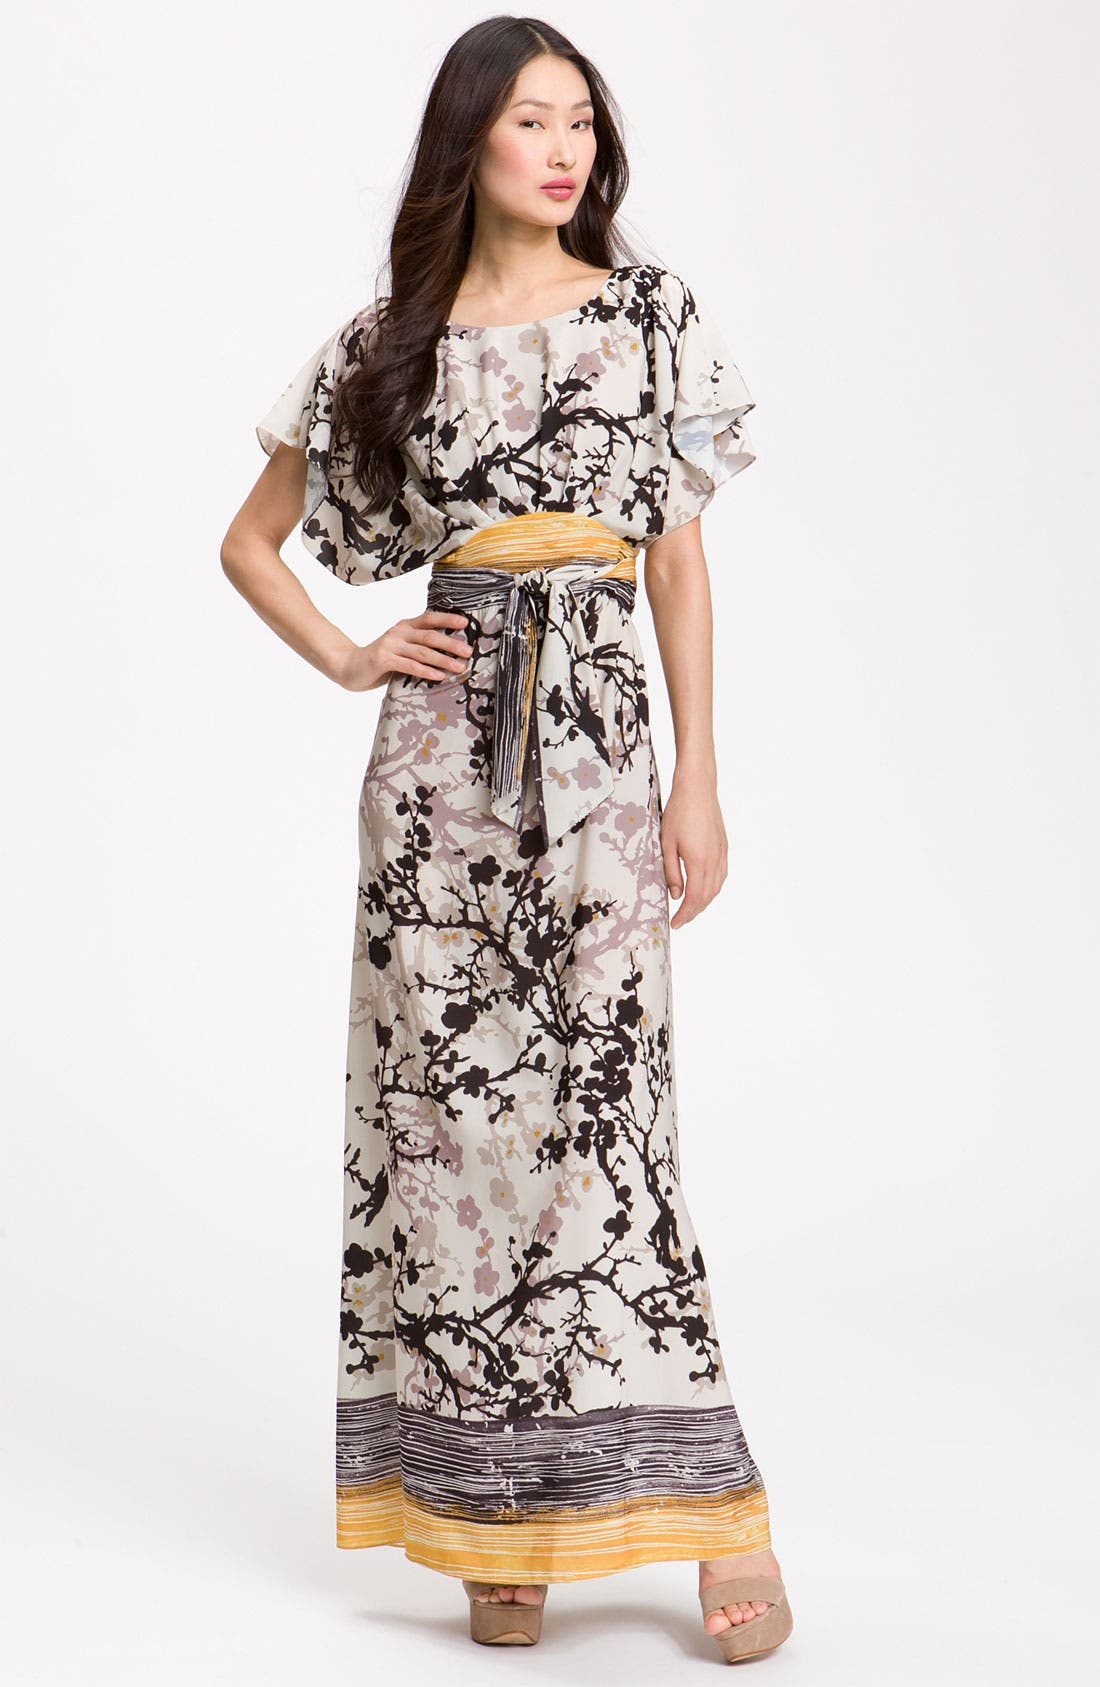 Main Image - Suzi Chin for Maggy Boutique Crêpe de Chine Maxi Dress